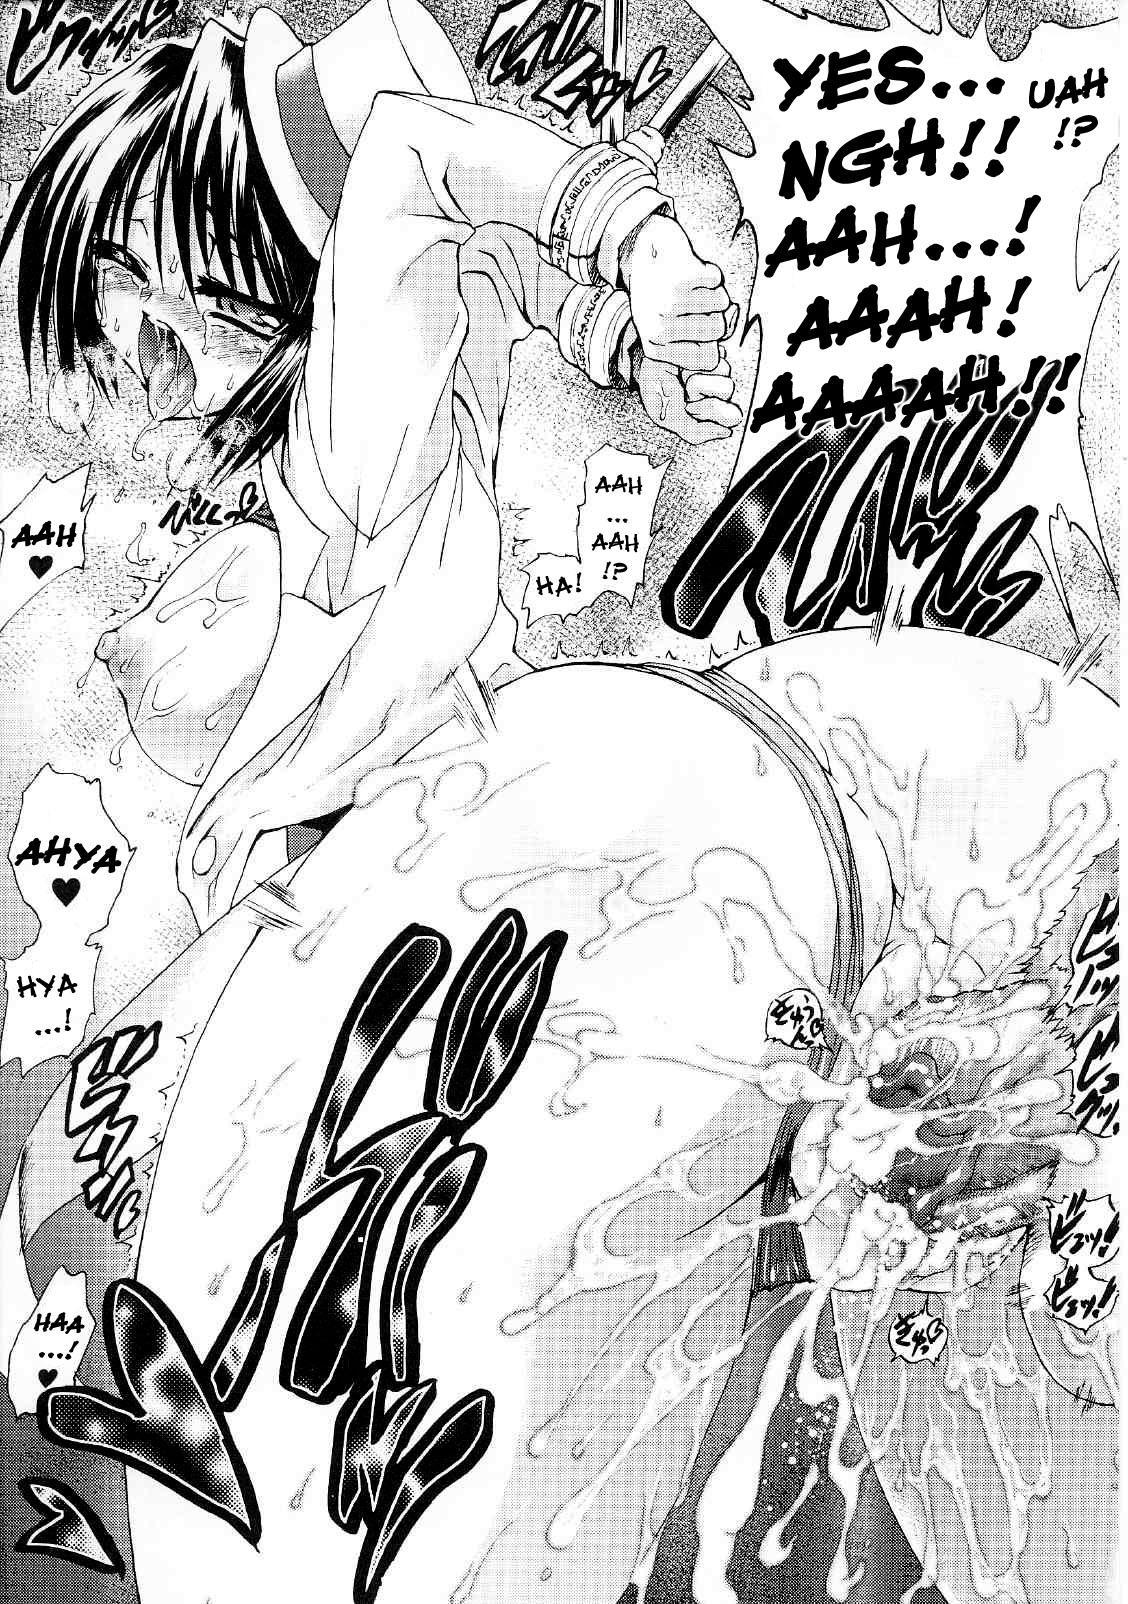 [Rougan] Ma ga Ochiru Yoru (The Night When Evil Falls) - Demonic Imitator Ch. 01-05 [ENG] 90